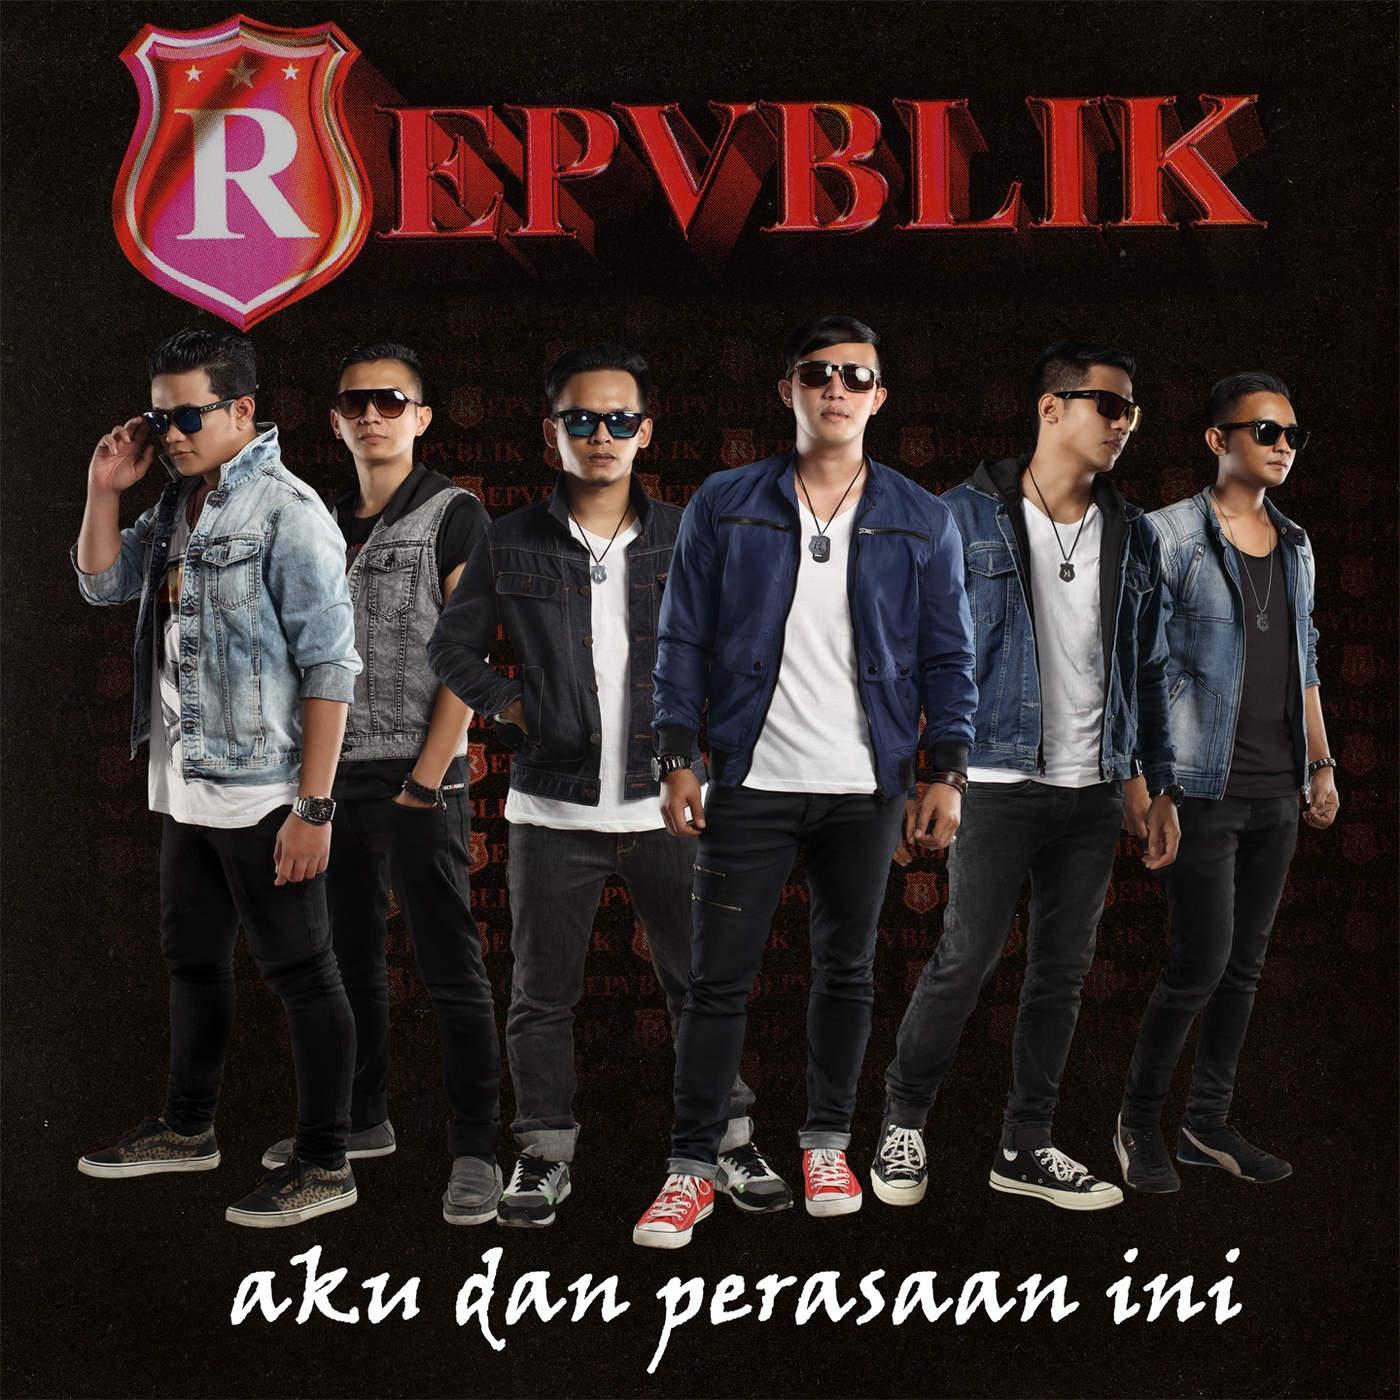 Chord Gitar Repvblik Aku Takut Lirik: Panji's POV: REPVBLIK Discography